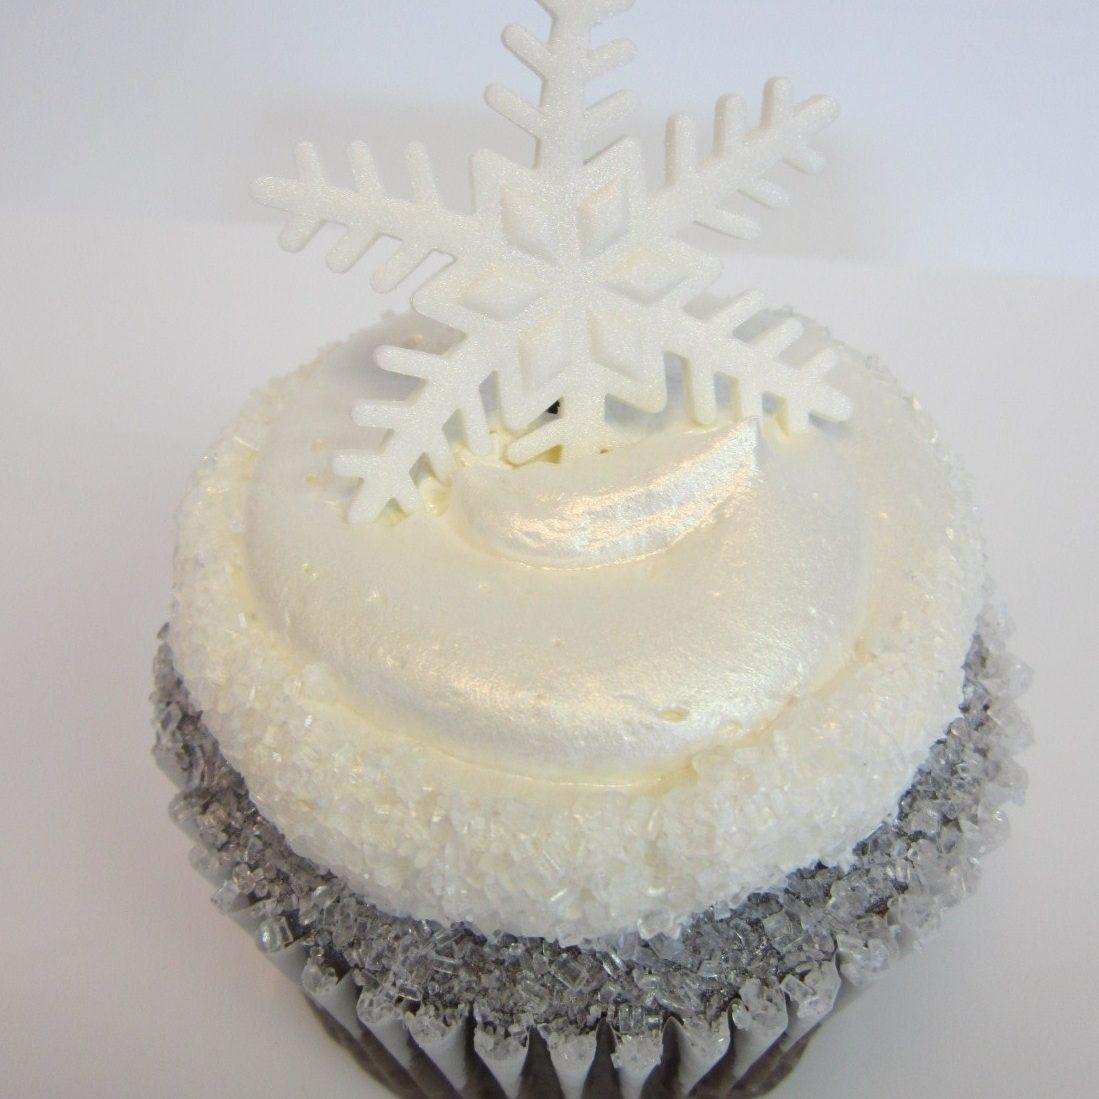 Frosty Chocolate Mint (Holiday)